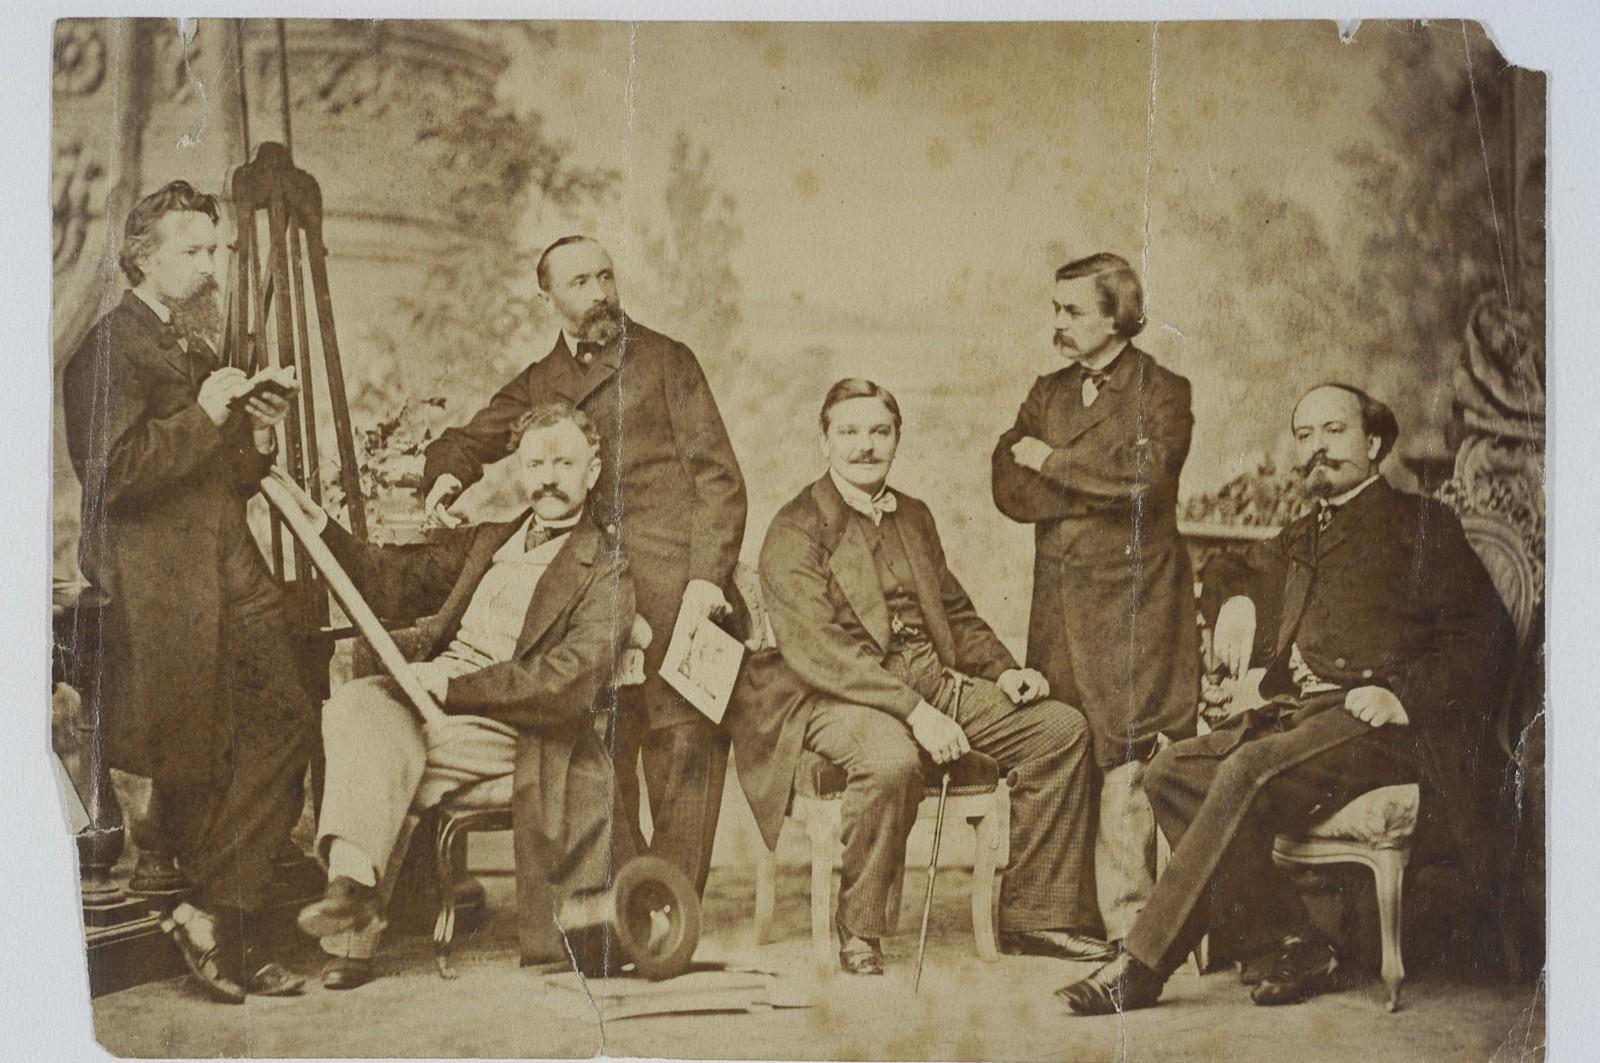 File:Gerson, Simmler, Olszyński, Kostrzewski, Kossak, 1858-60.